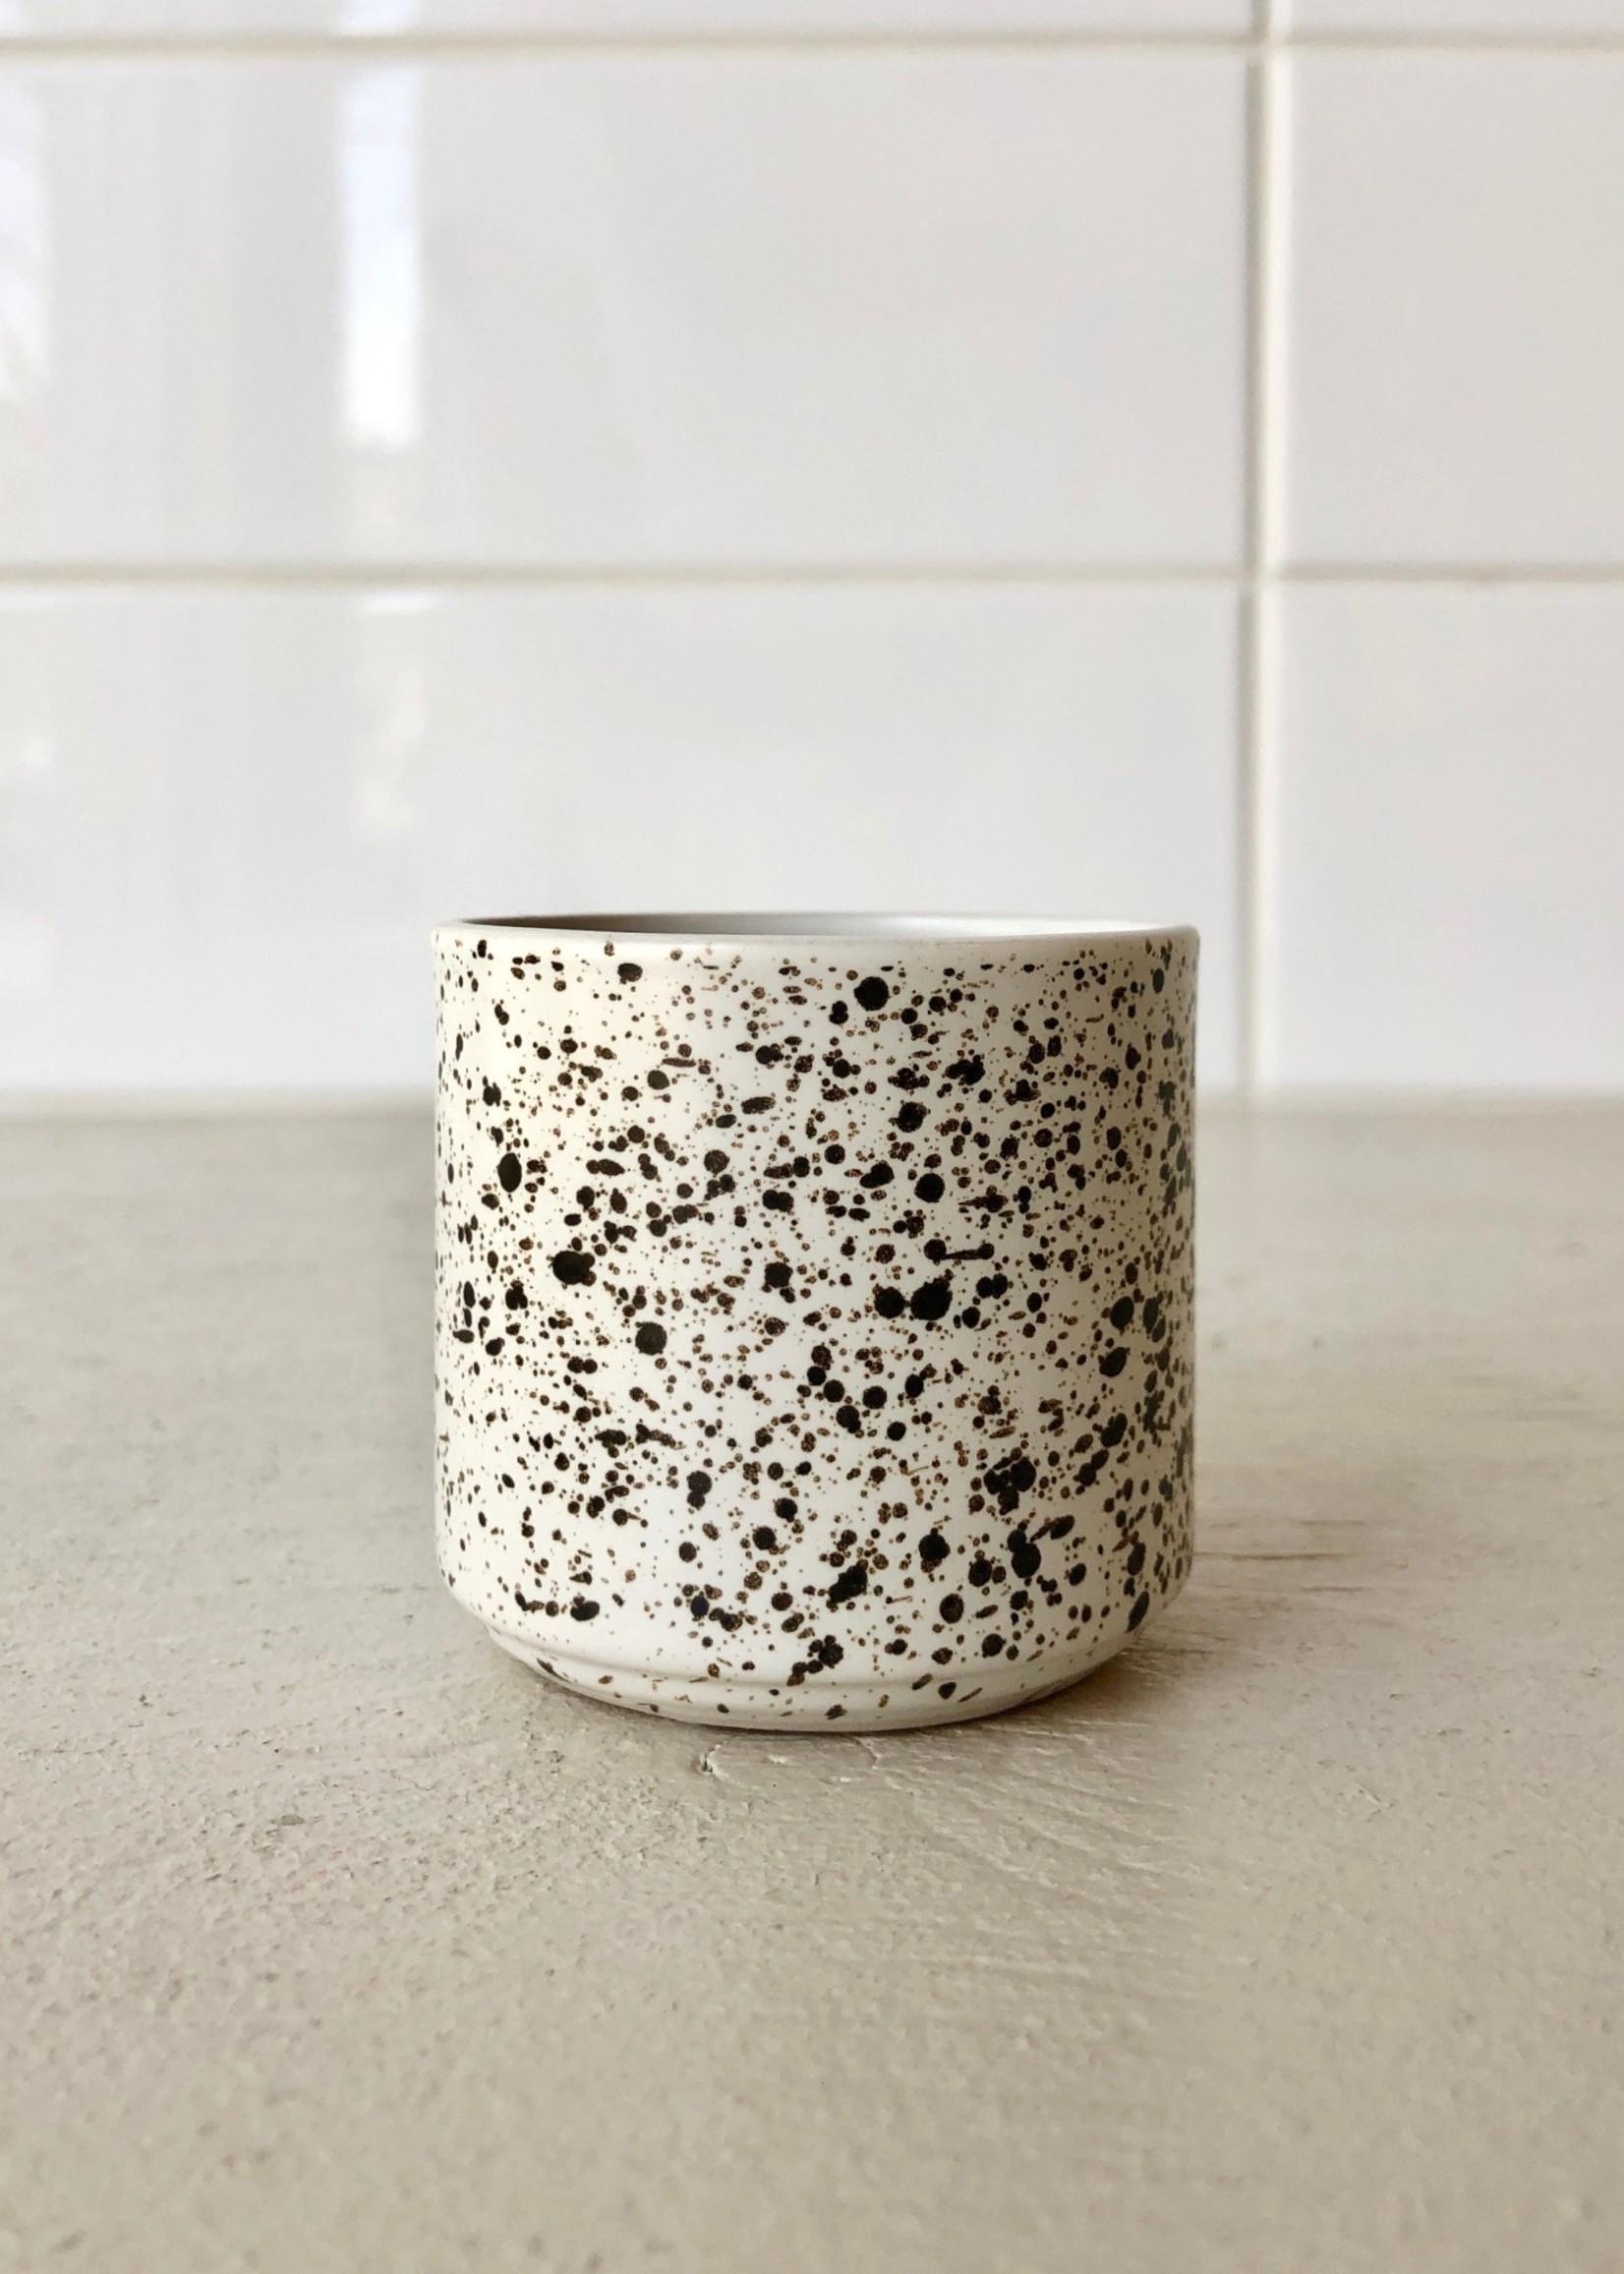 Bovi Home Black Splatter Candle Holder by Bovi Home